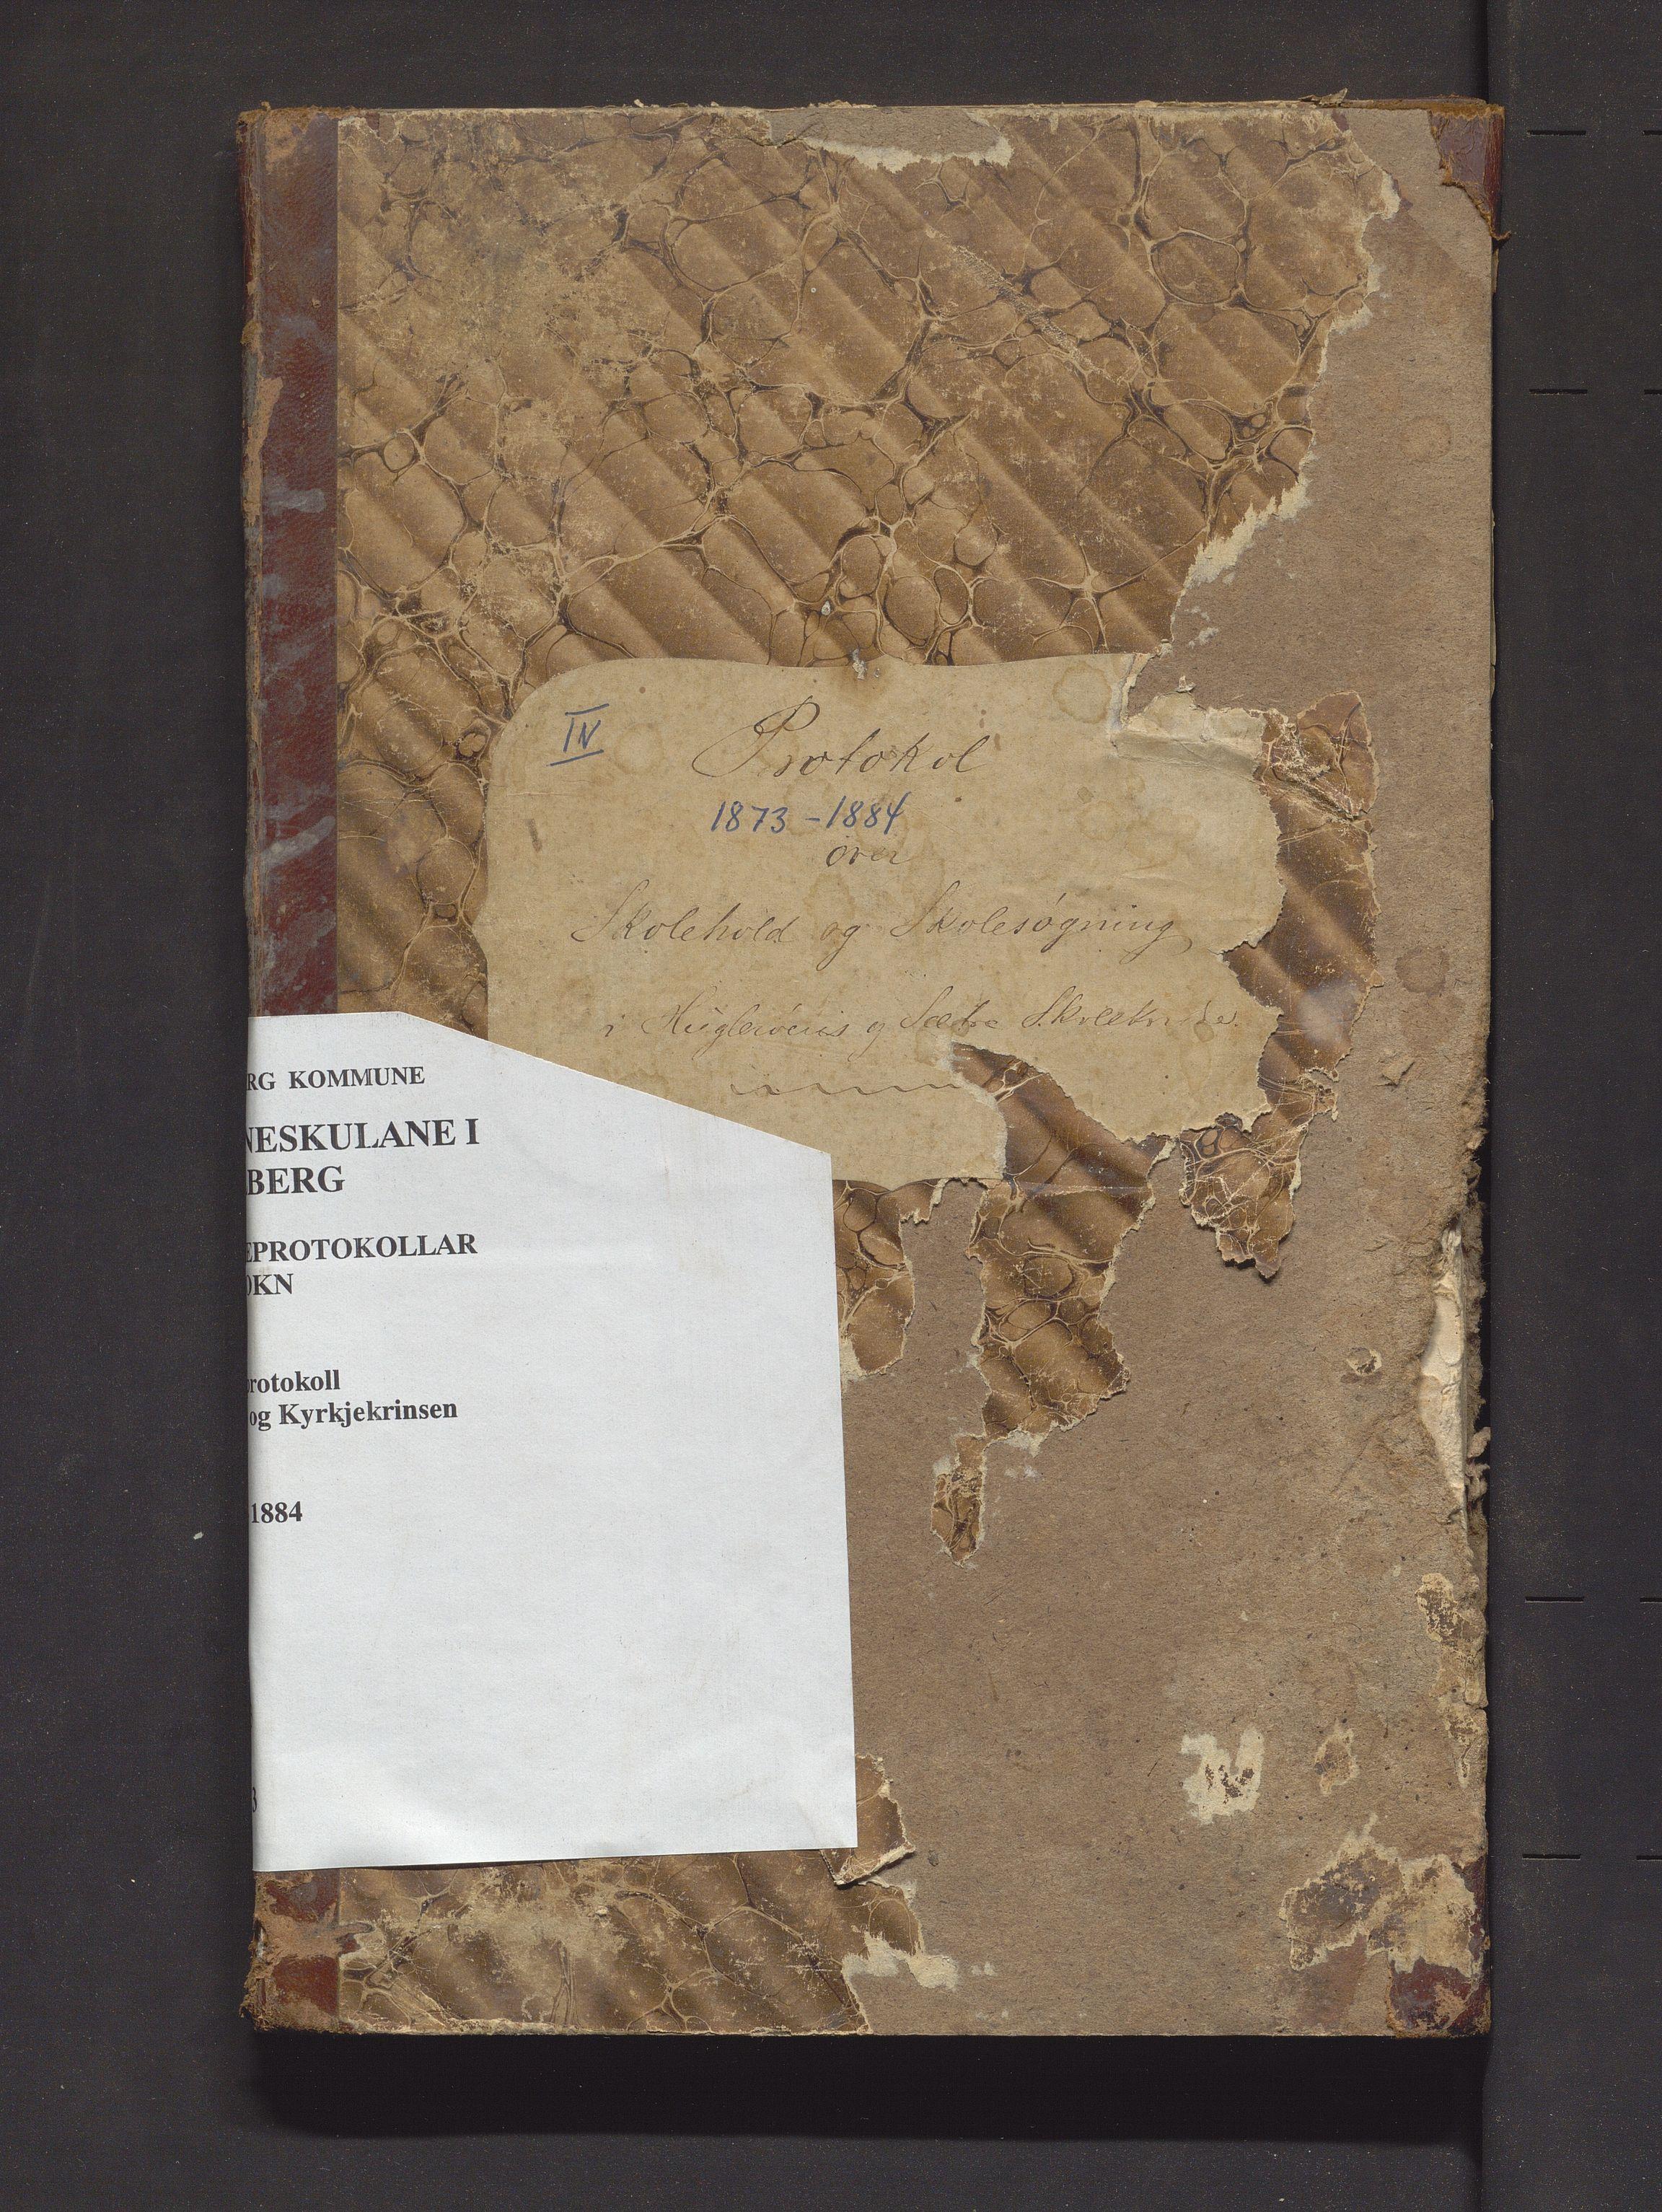 IKAH, Fjelberg kommune. Barneskulane, F/Fb/L0003: Skuleprotokoll for Huglo, Kyrkjekrinsen og Sætre krinsar, 1873-1884